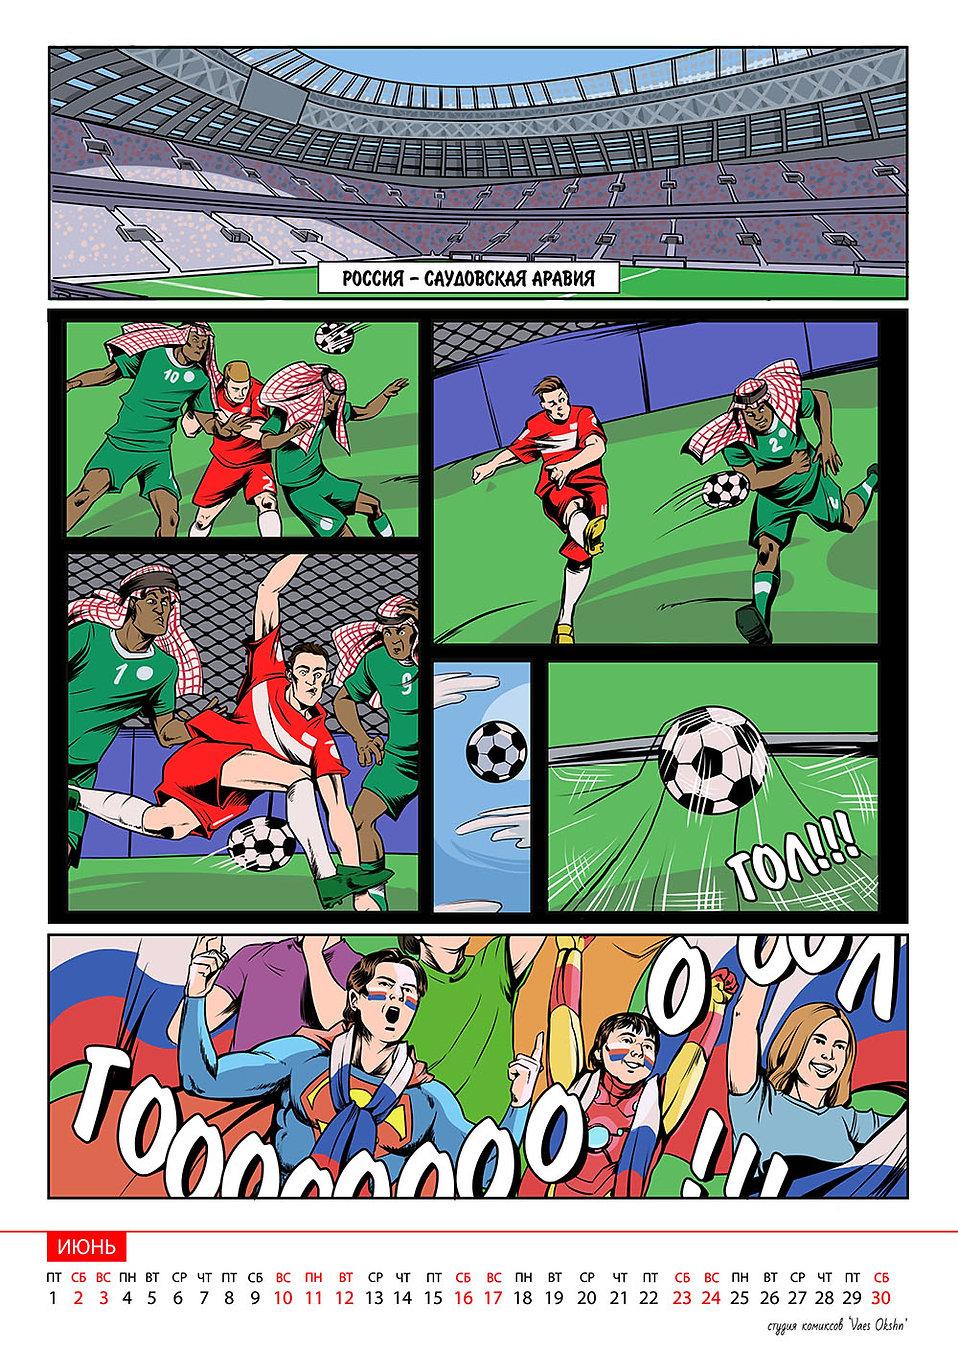 Комикс календарь июнь. Комиксы на заказ